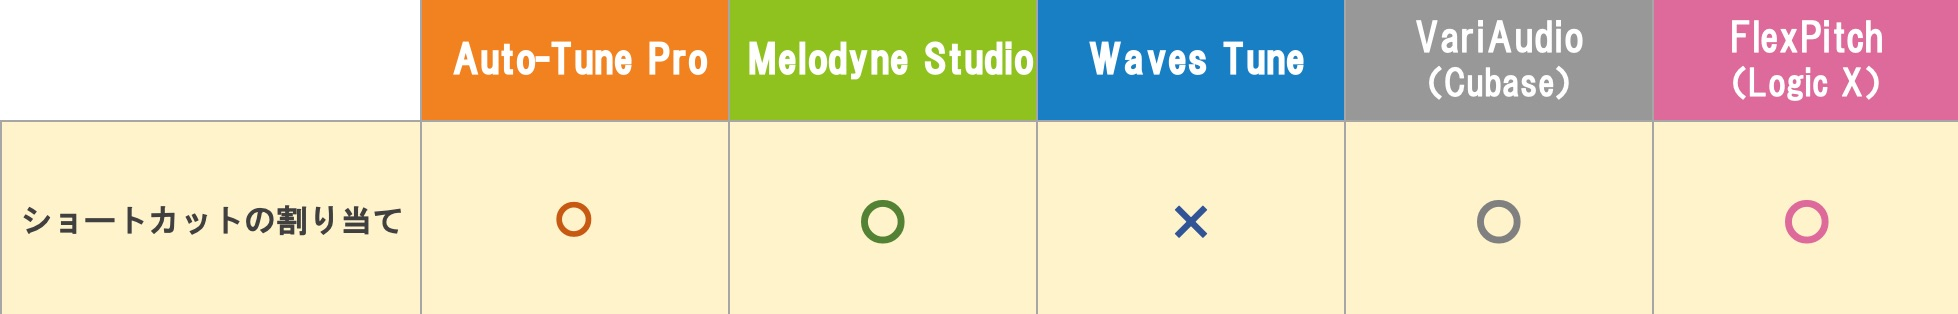 Pich補正ソフト比較表_の_ワークシート